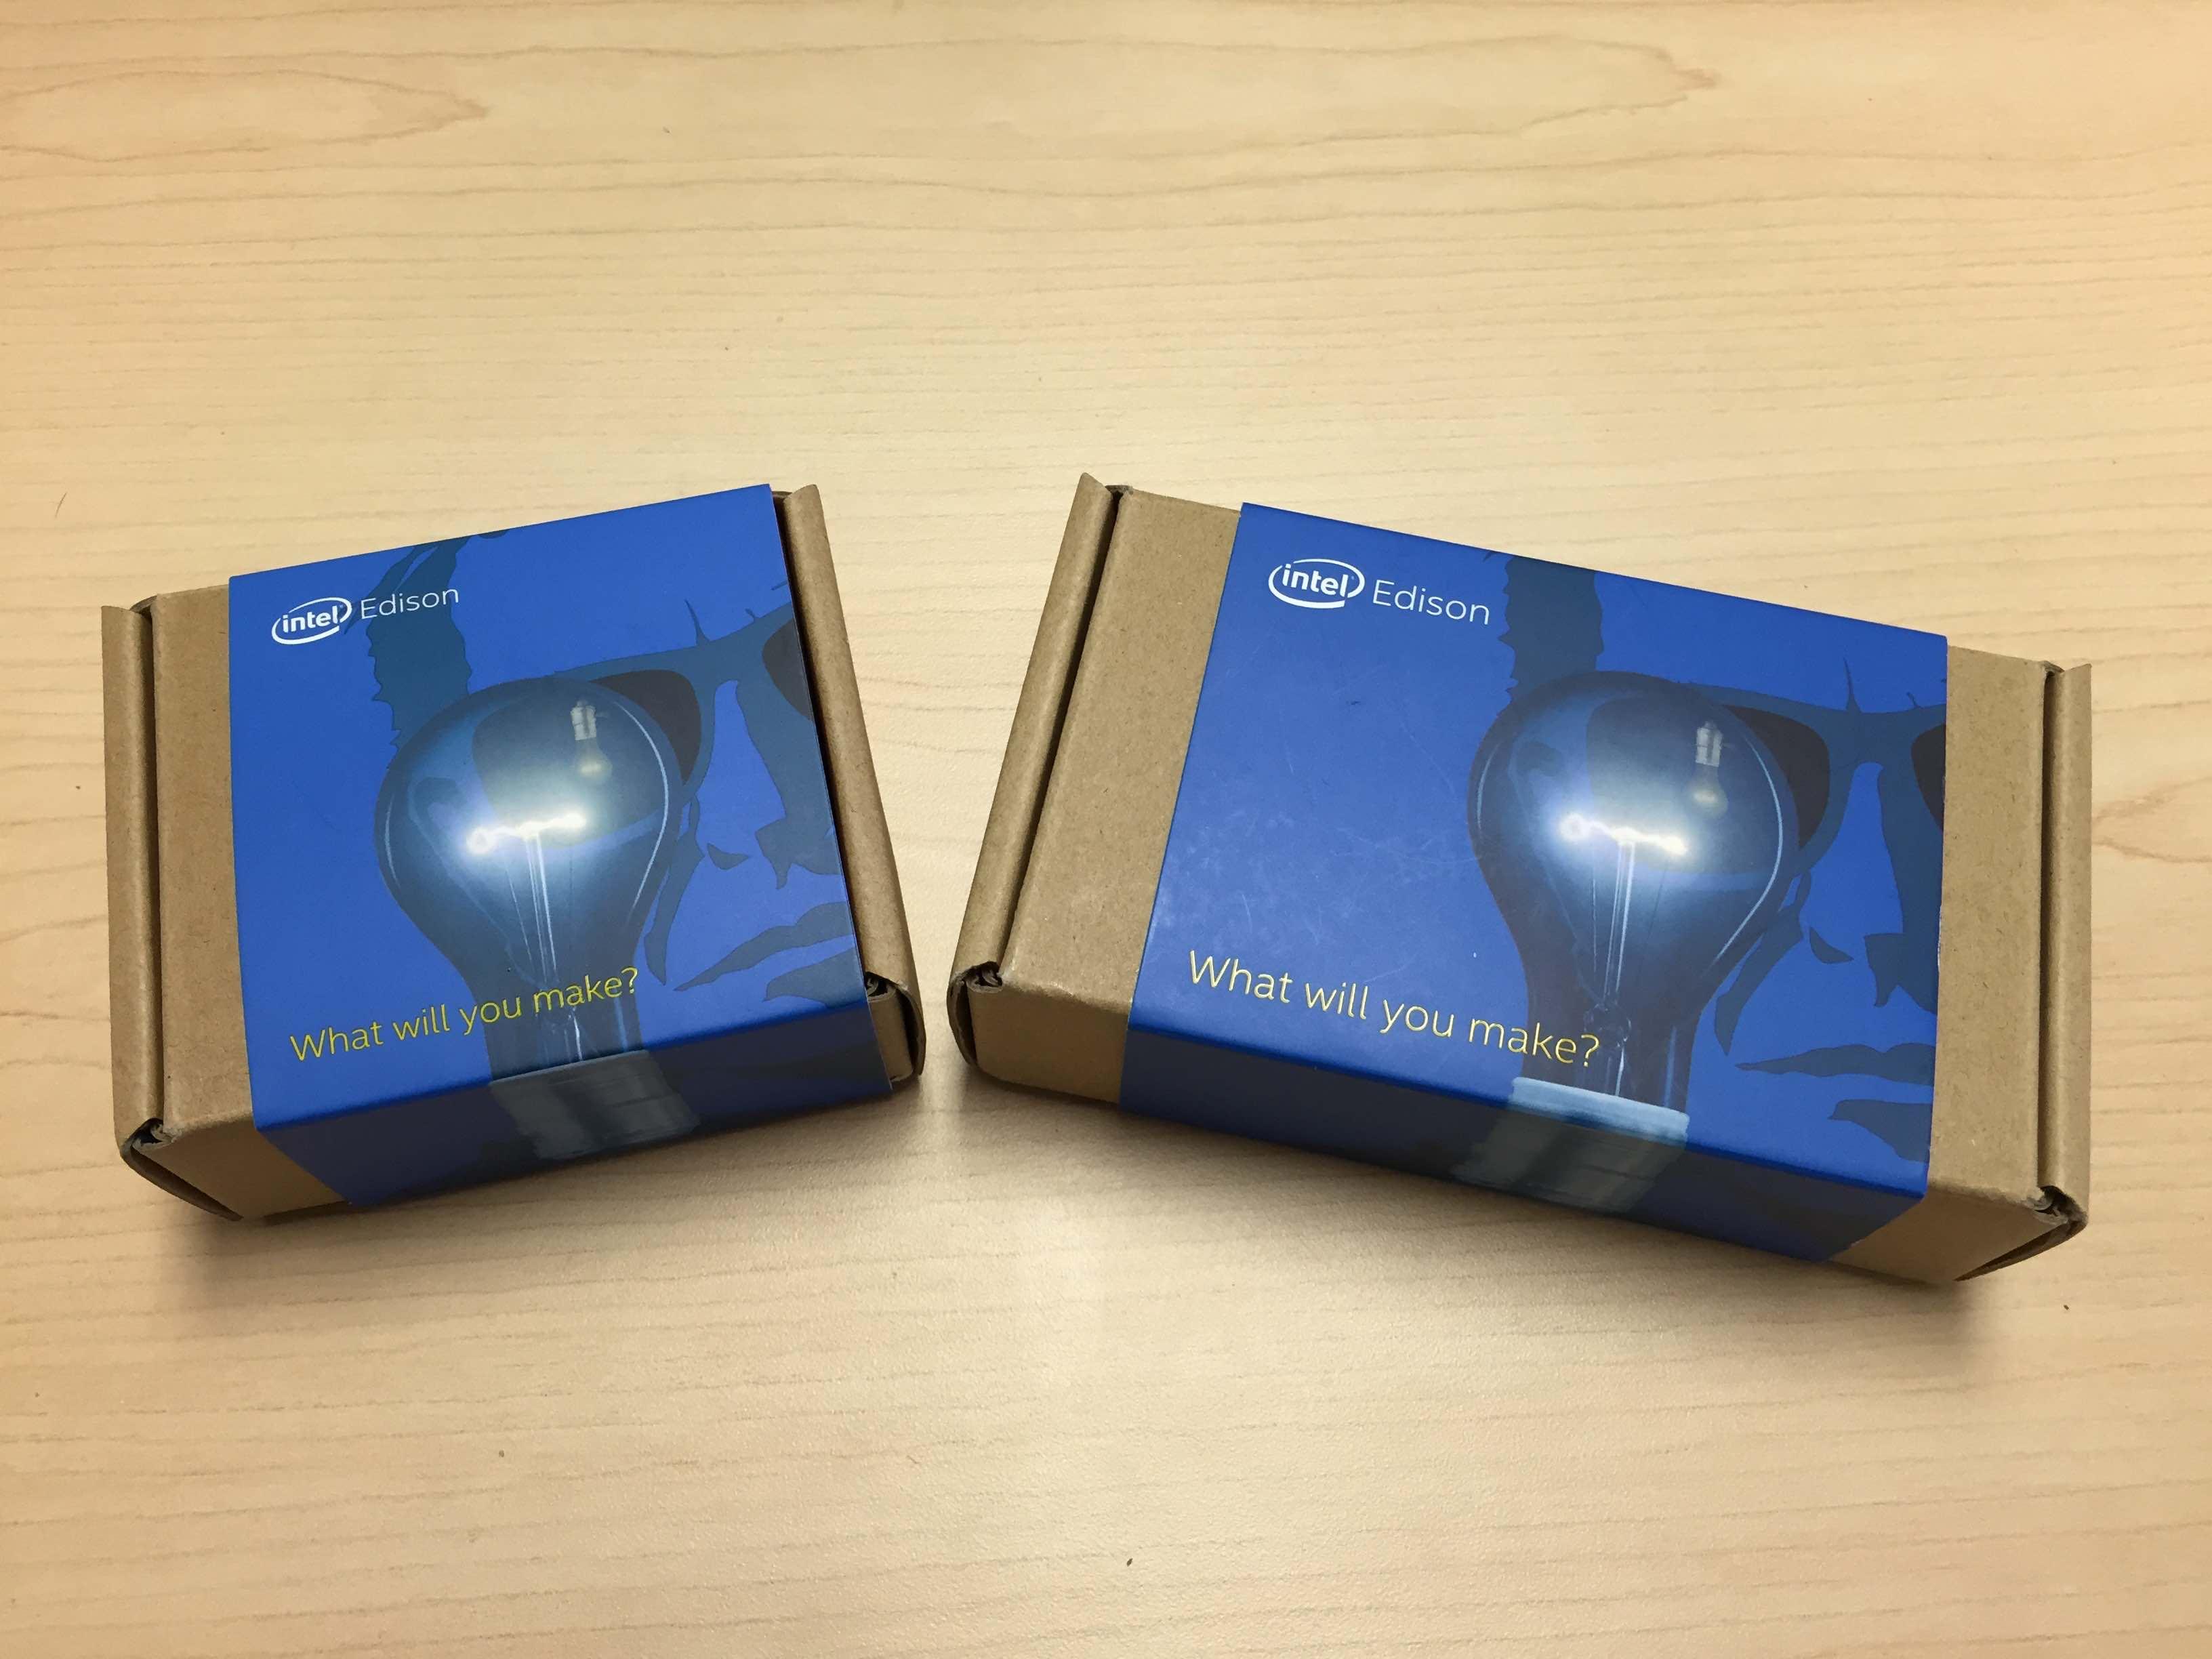 Edison kits for Mini and Arduino breakout boards